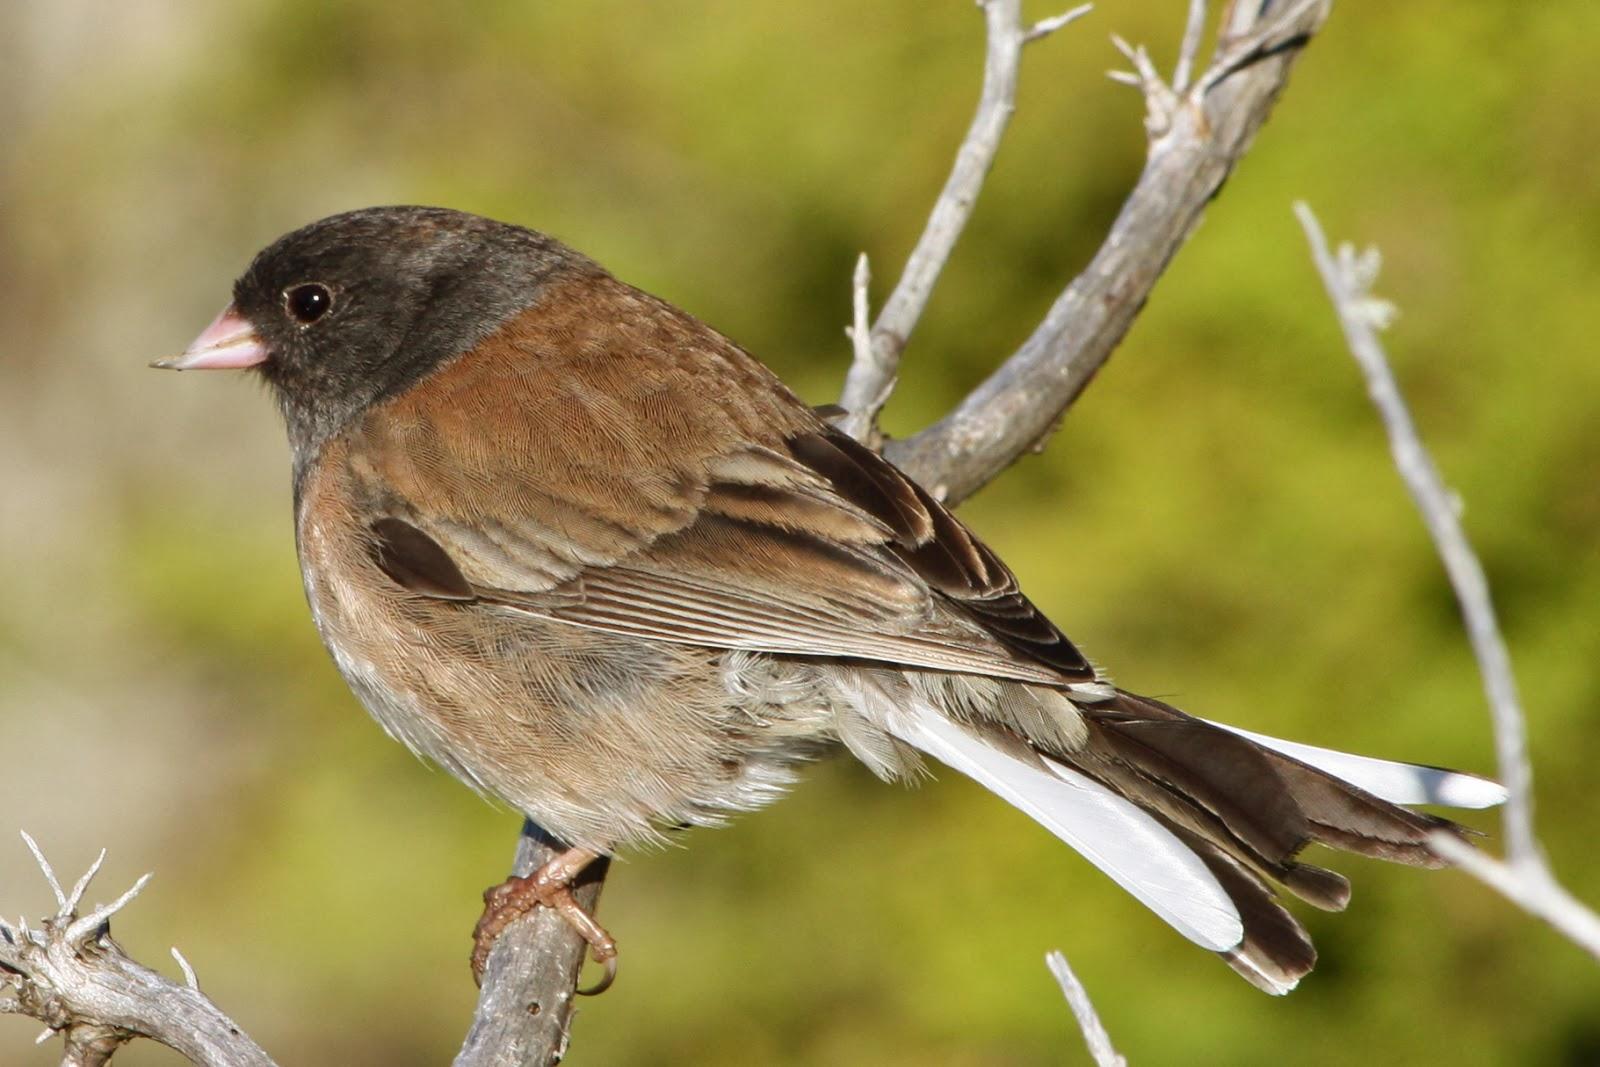 Lola Nova - Whatever Lola Wants: For the Birds